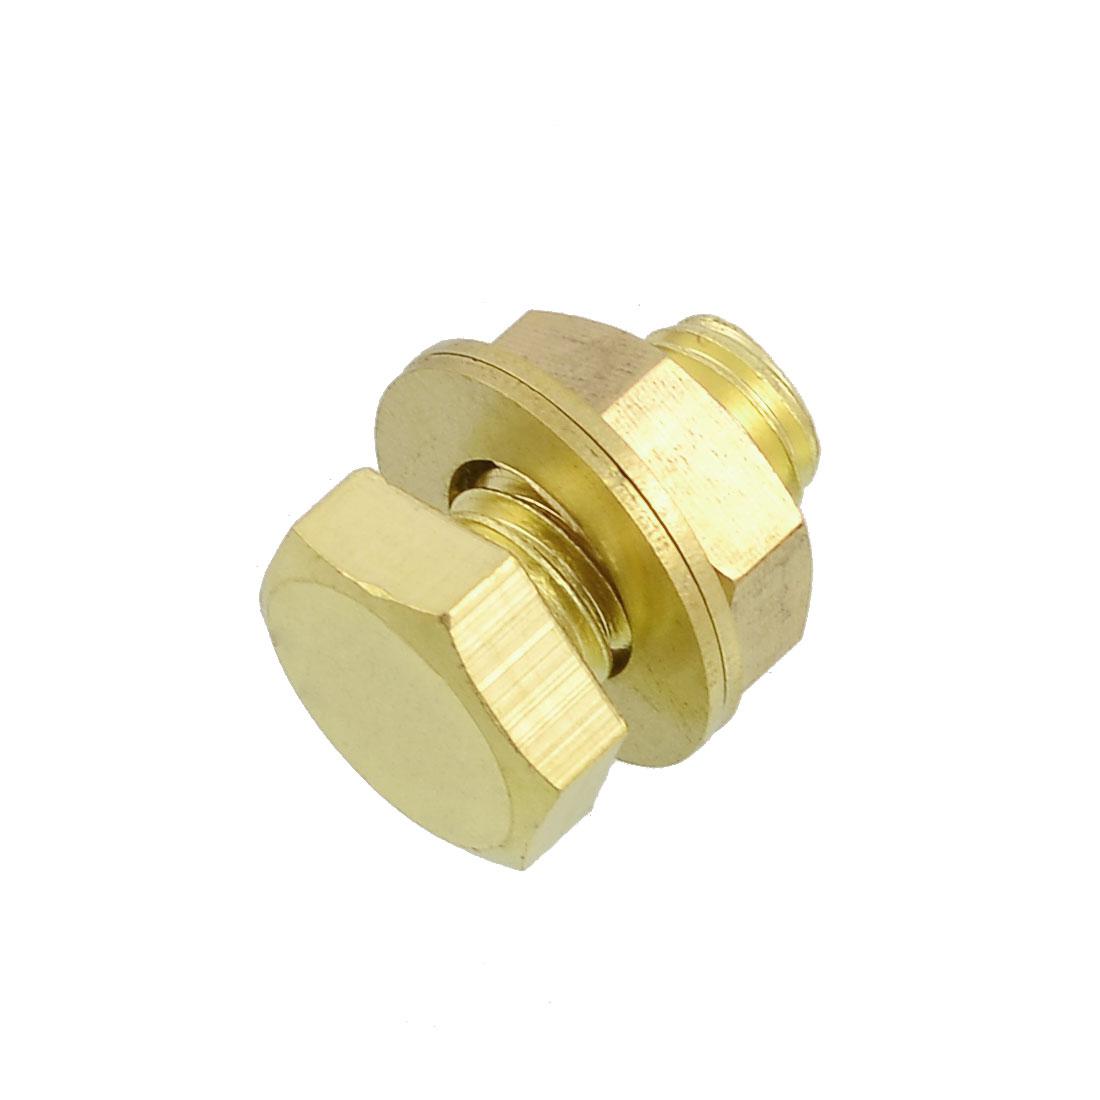 Gold Tone Solid Brass Hex Screw Fastener 12mm x 20mm w Nut Gaskets